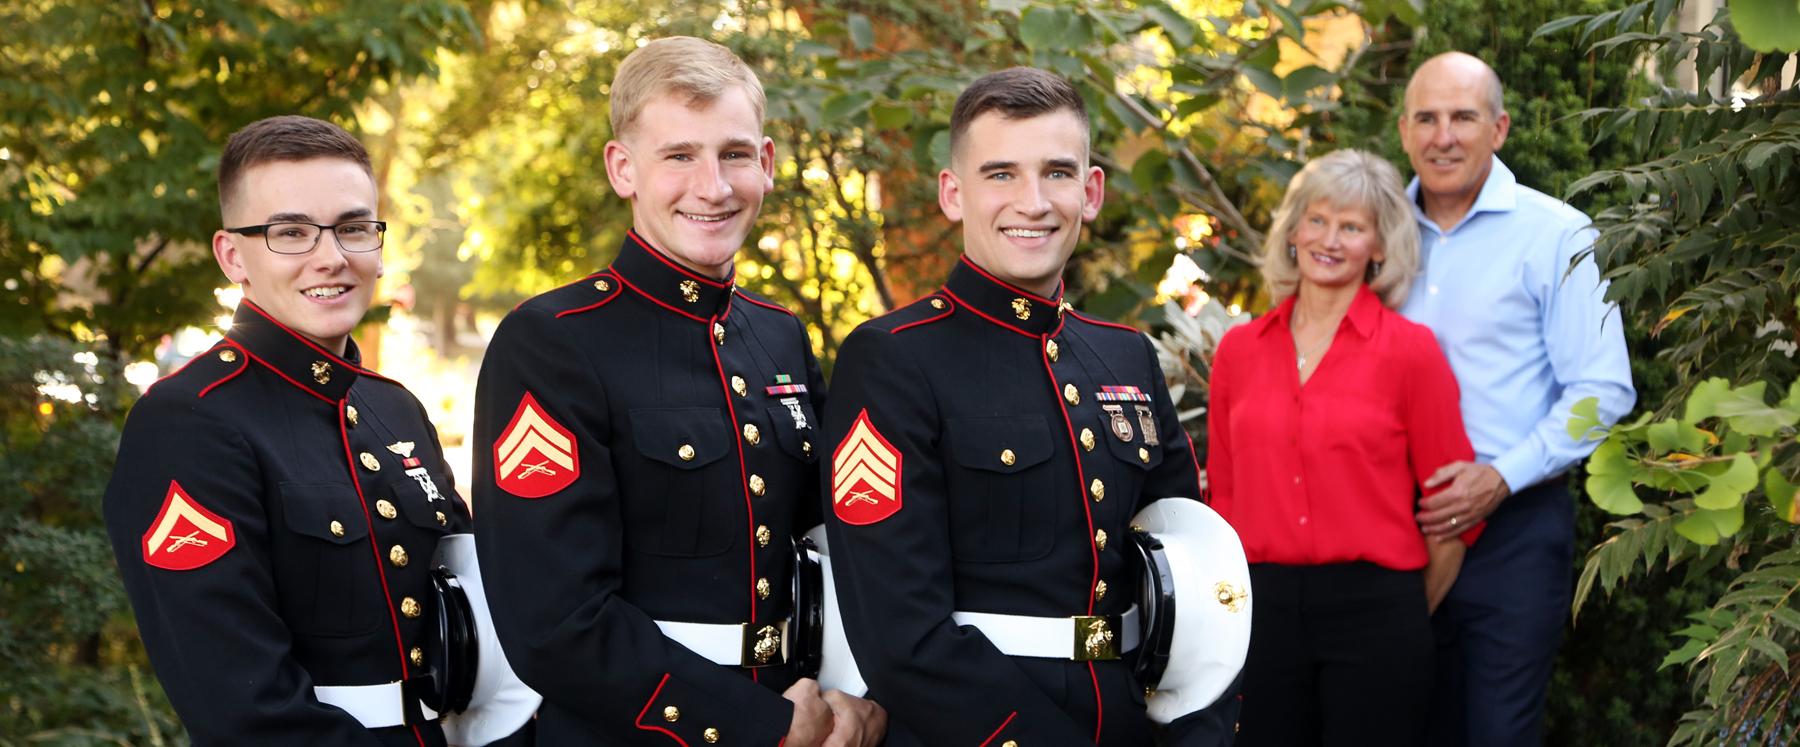 Military discount family portraits Eugene Oregon sons Marines.jpg